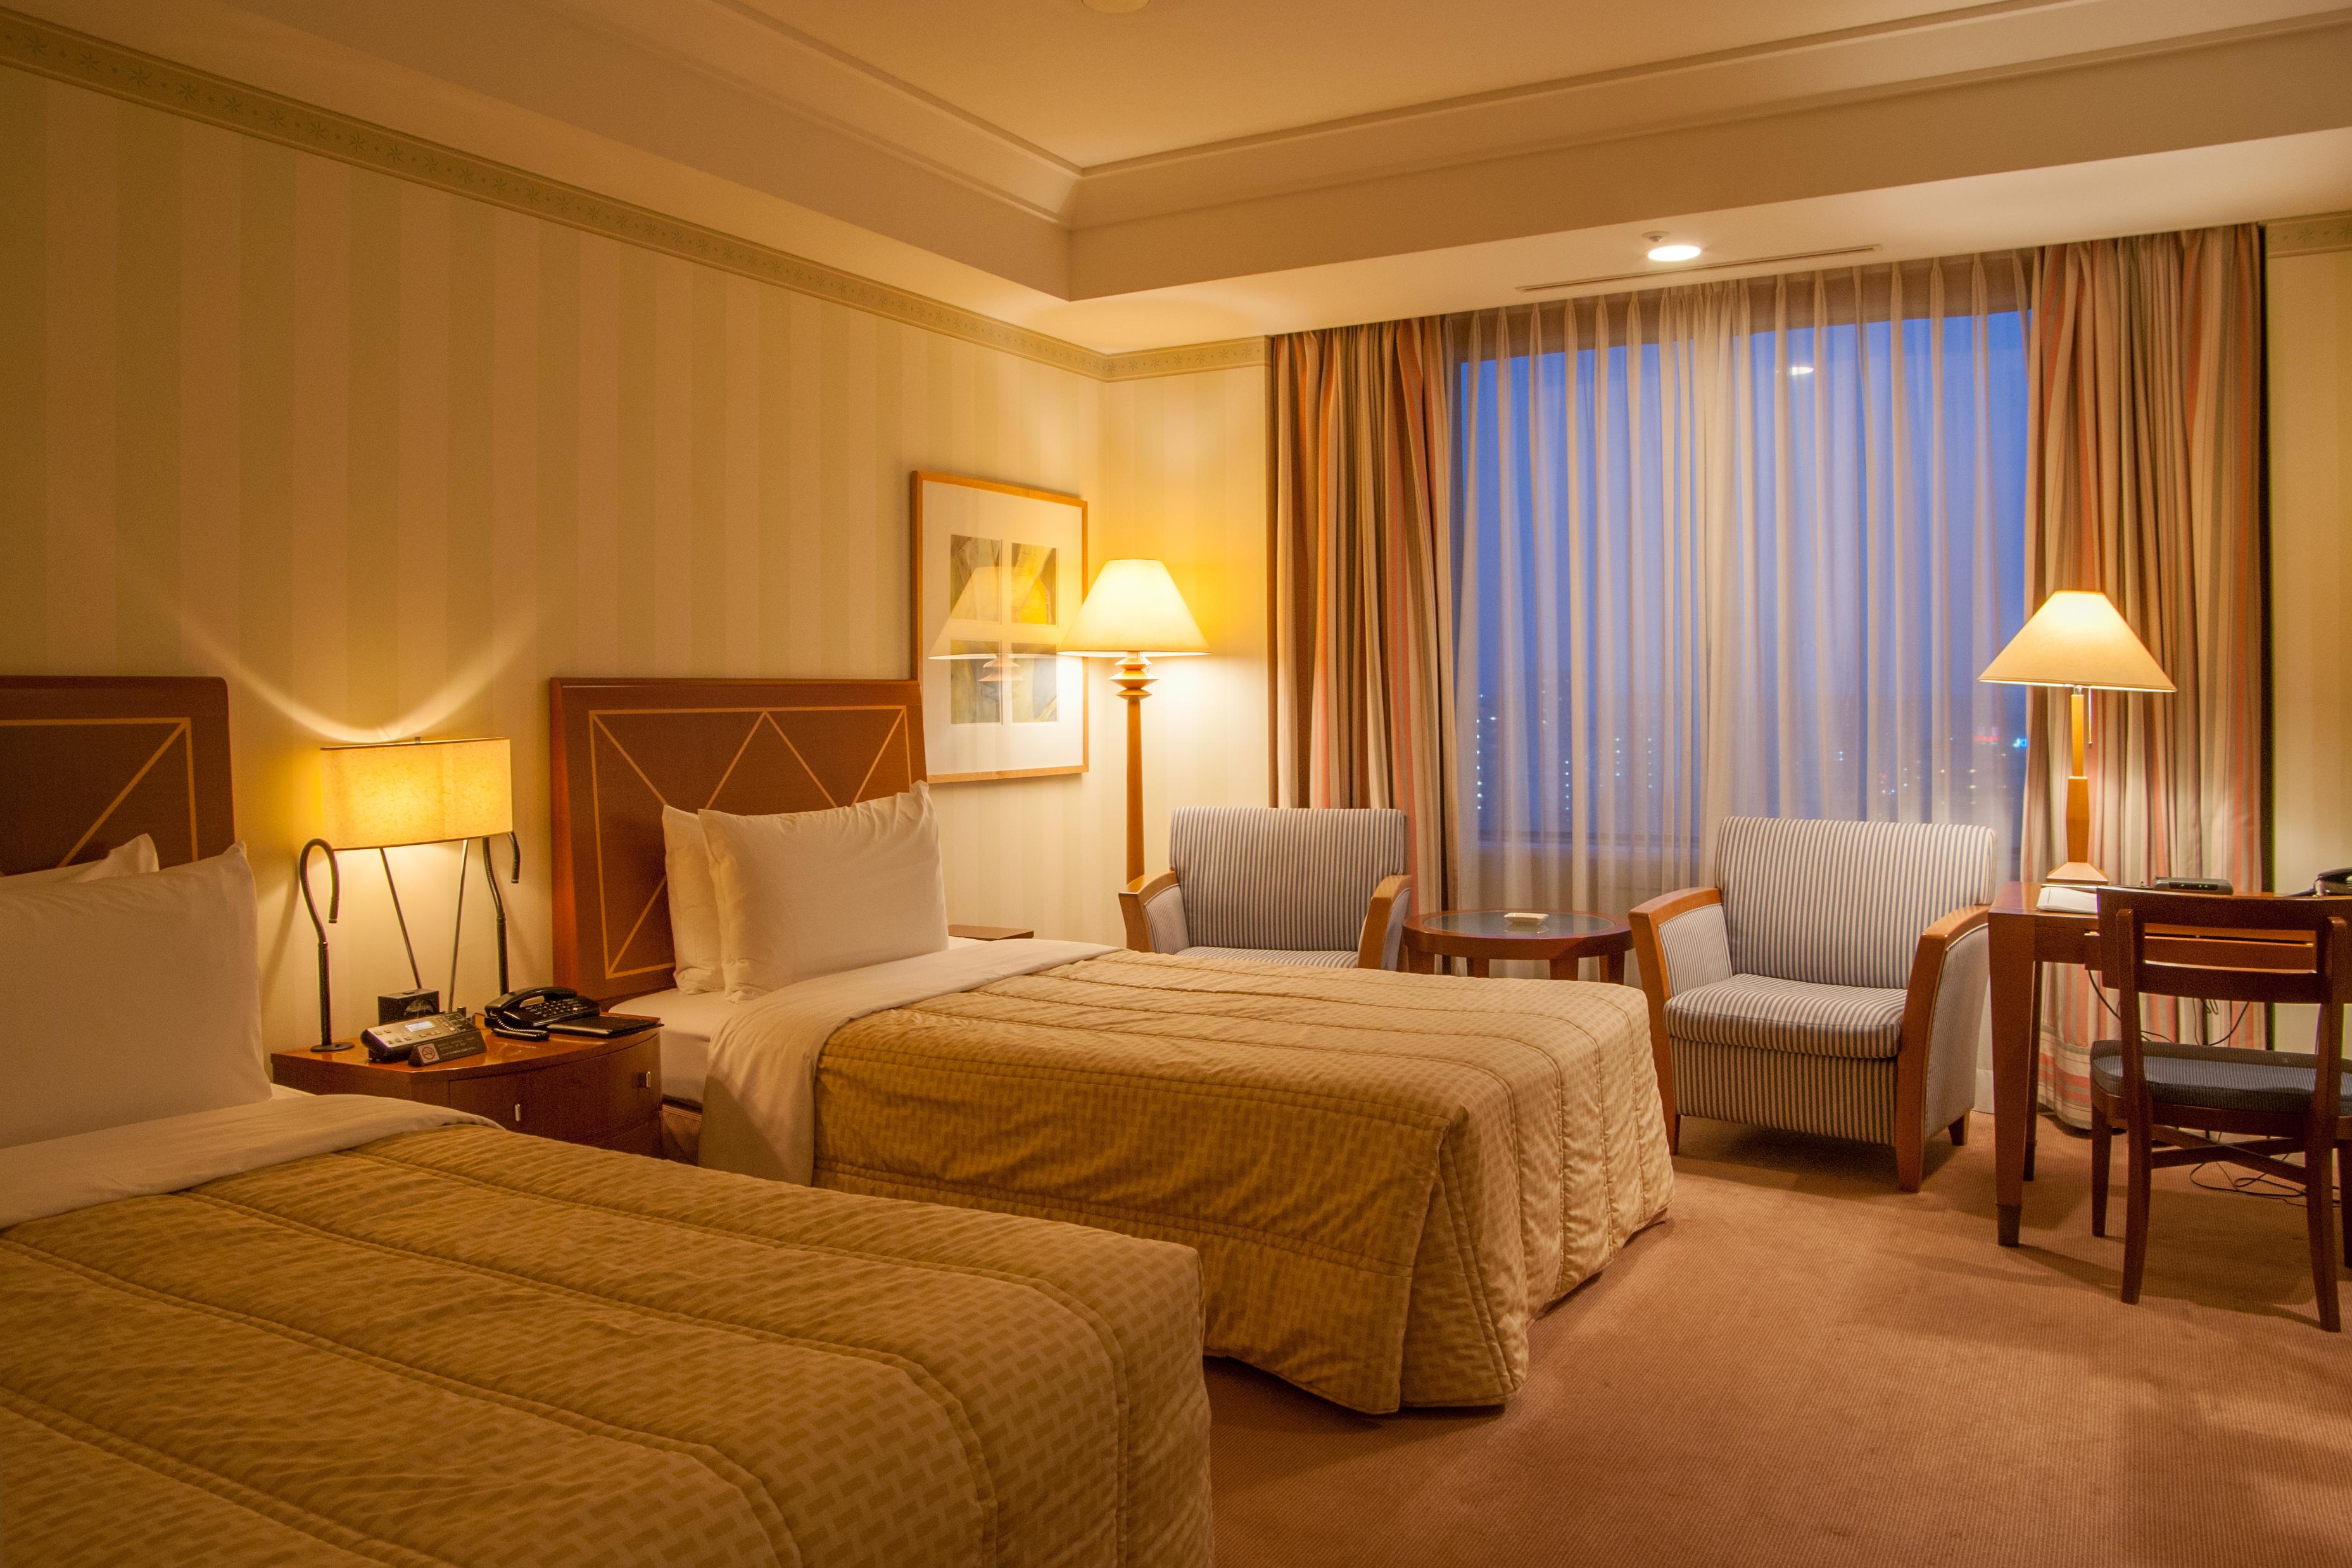 Twin Room Hotel In Bradford